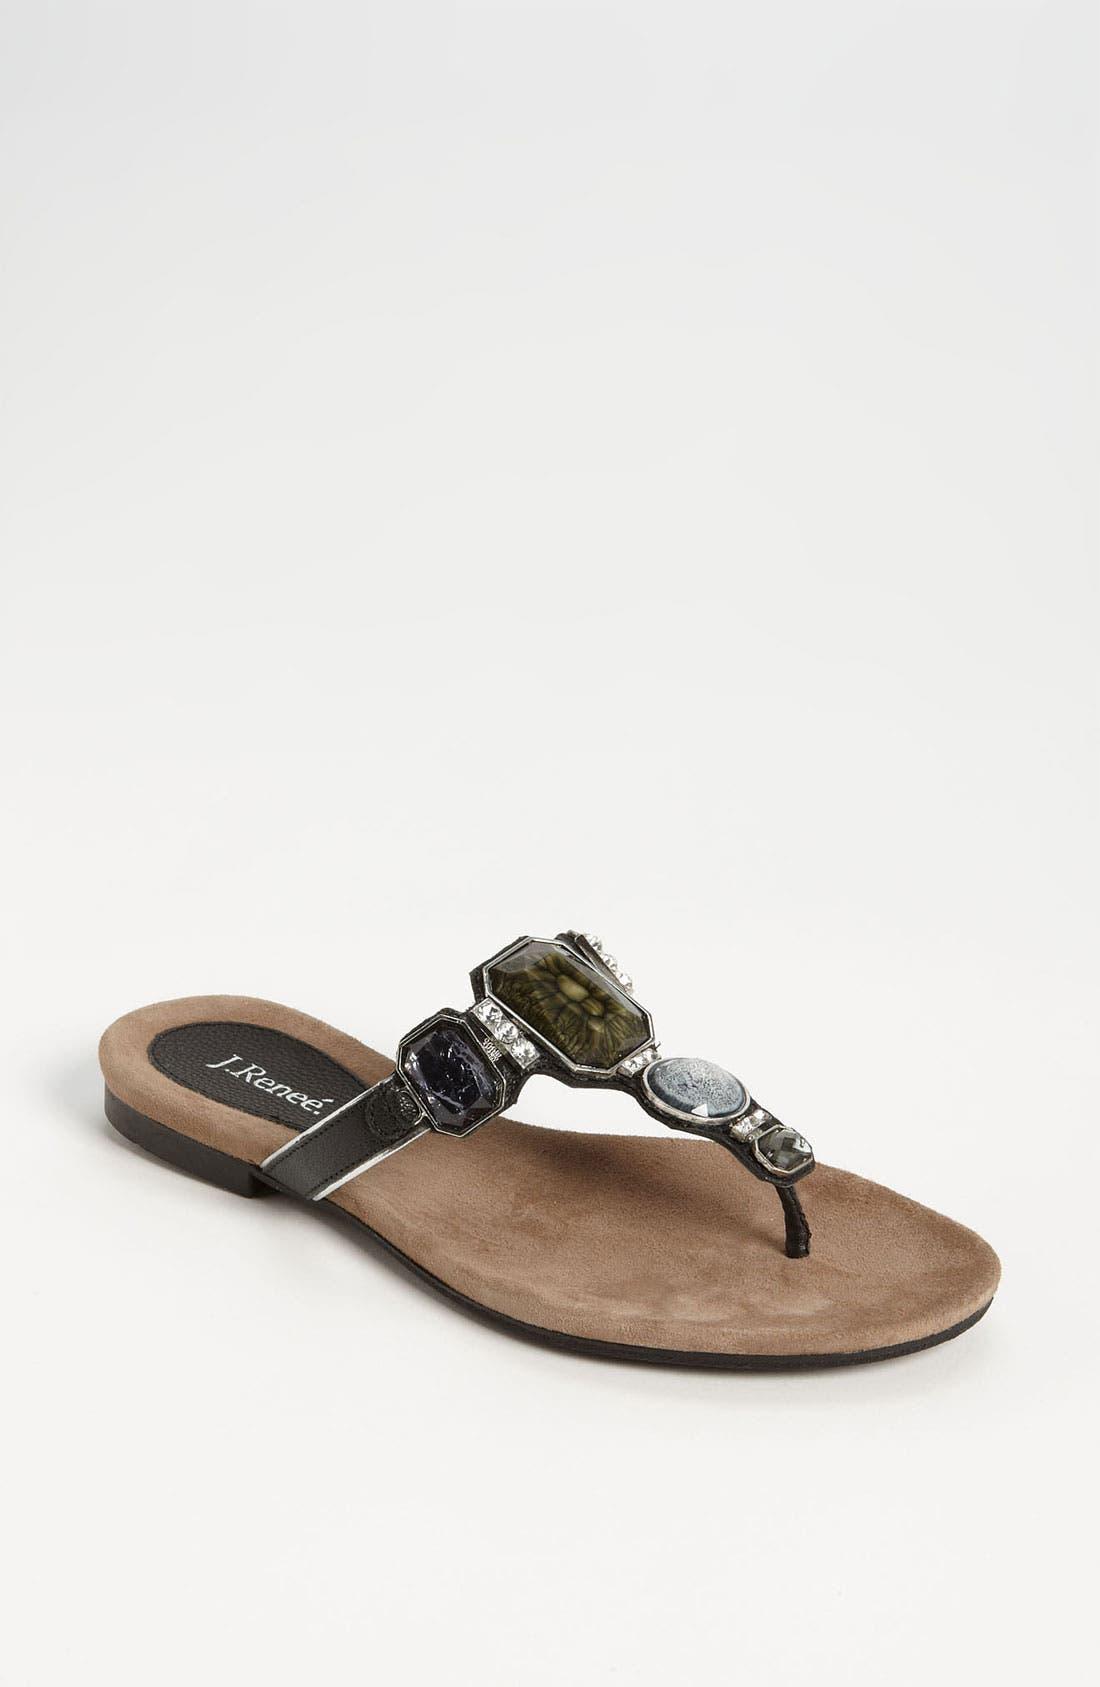 Main Image - J. Reneé 'Jasper' Sandal